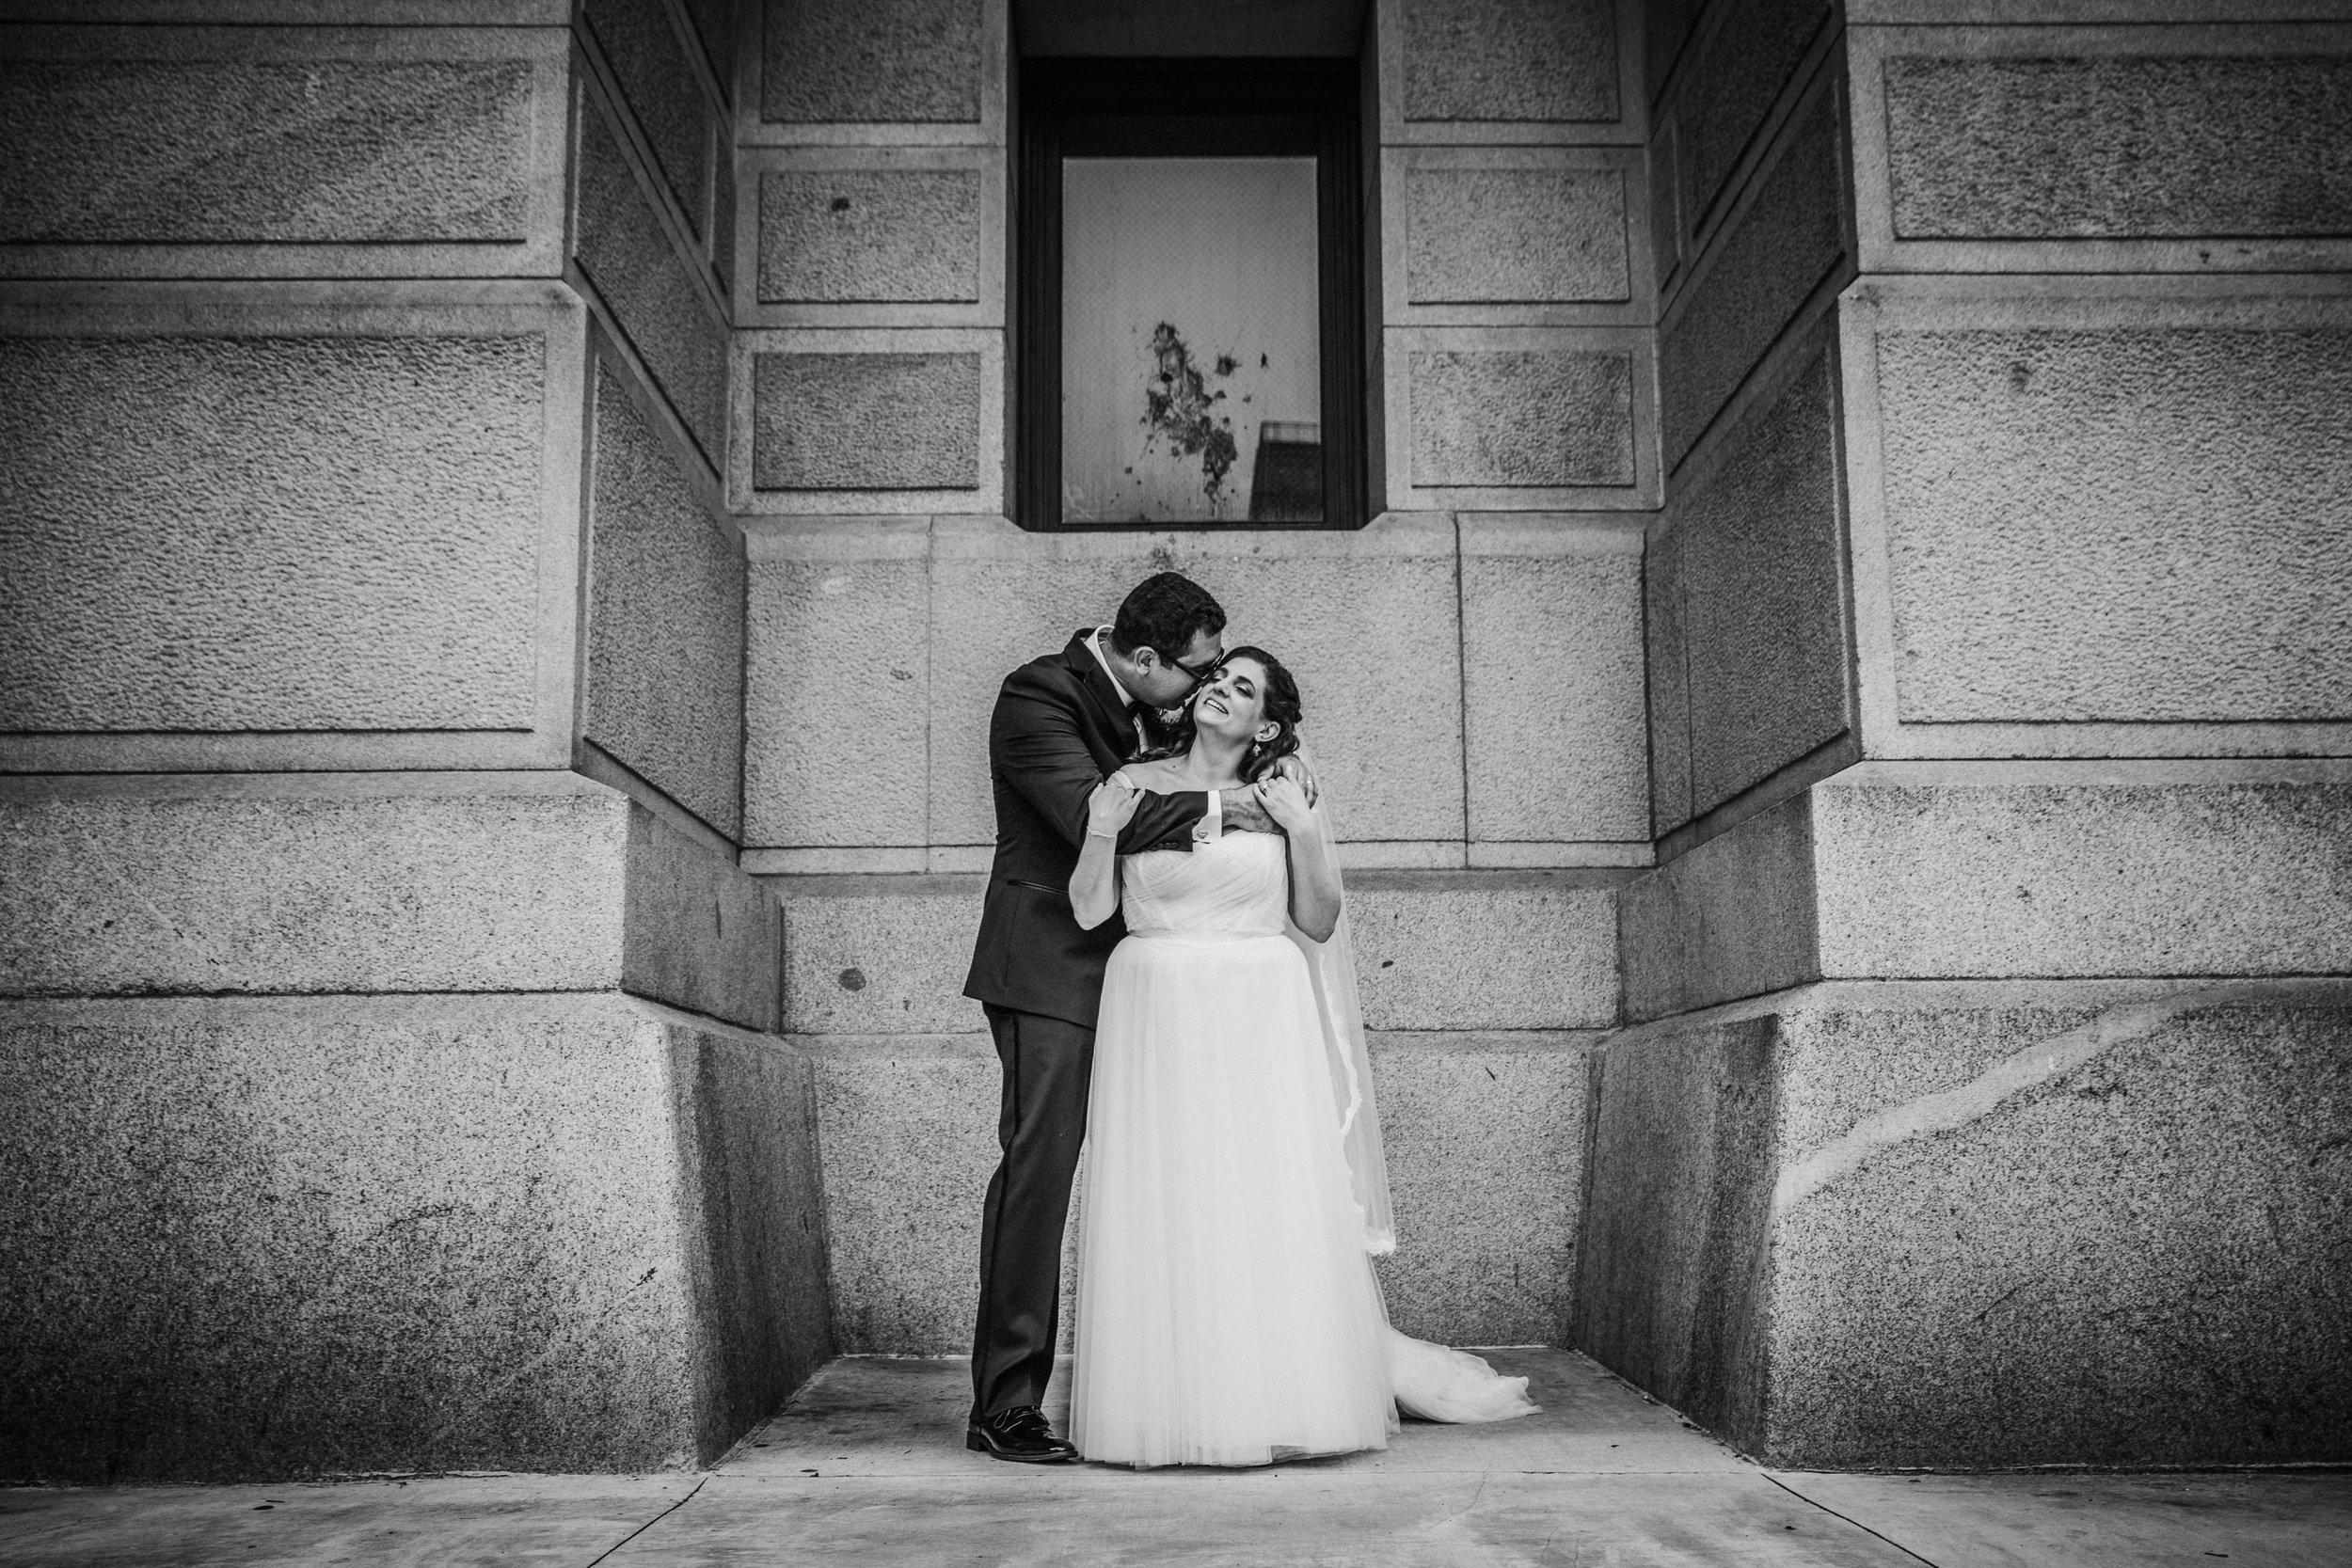 JennaLynnPhotography-NJWeddingPhotographer-Philadelphia-Wedding-ArtsBallroom-Bride&GroomBW-16.jpg